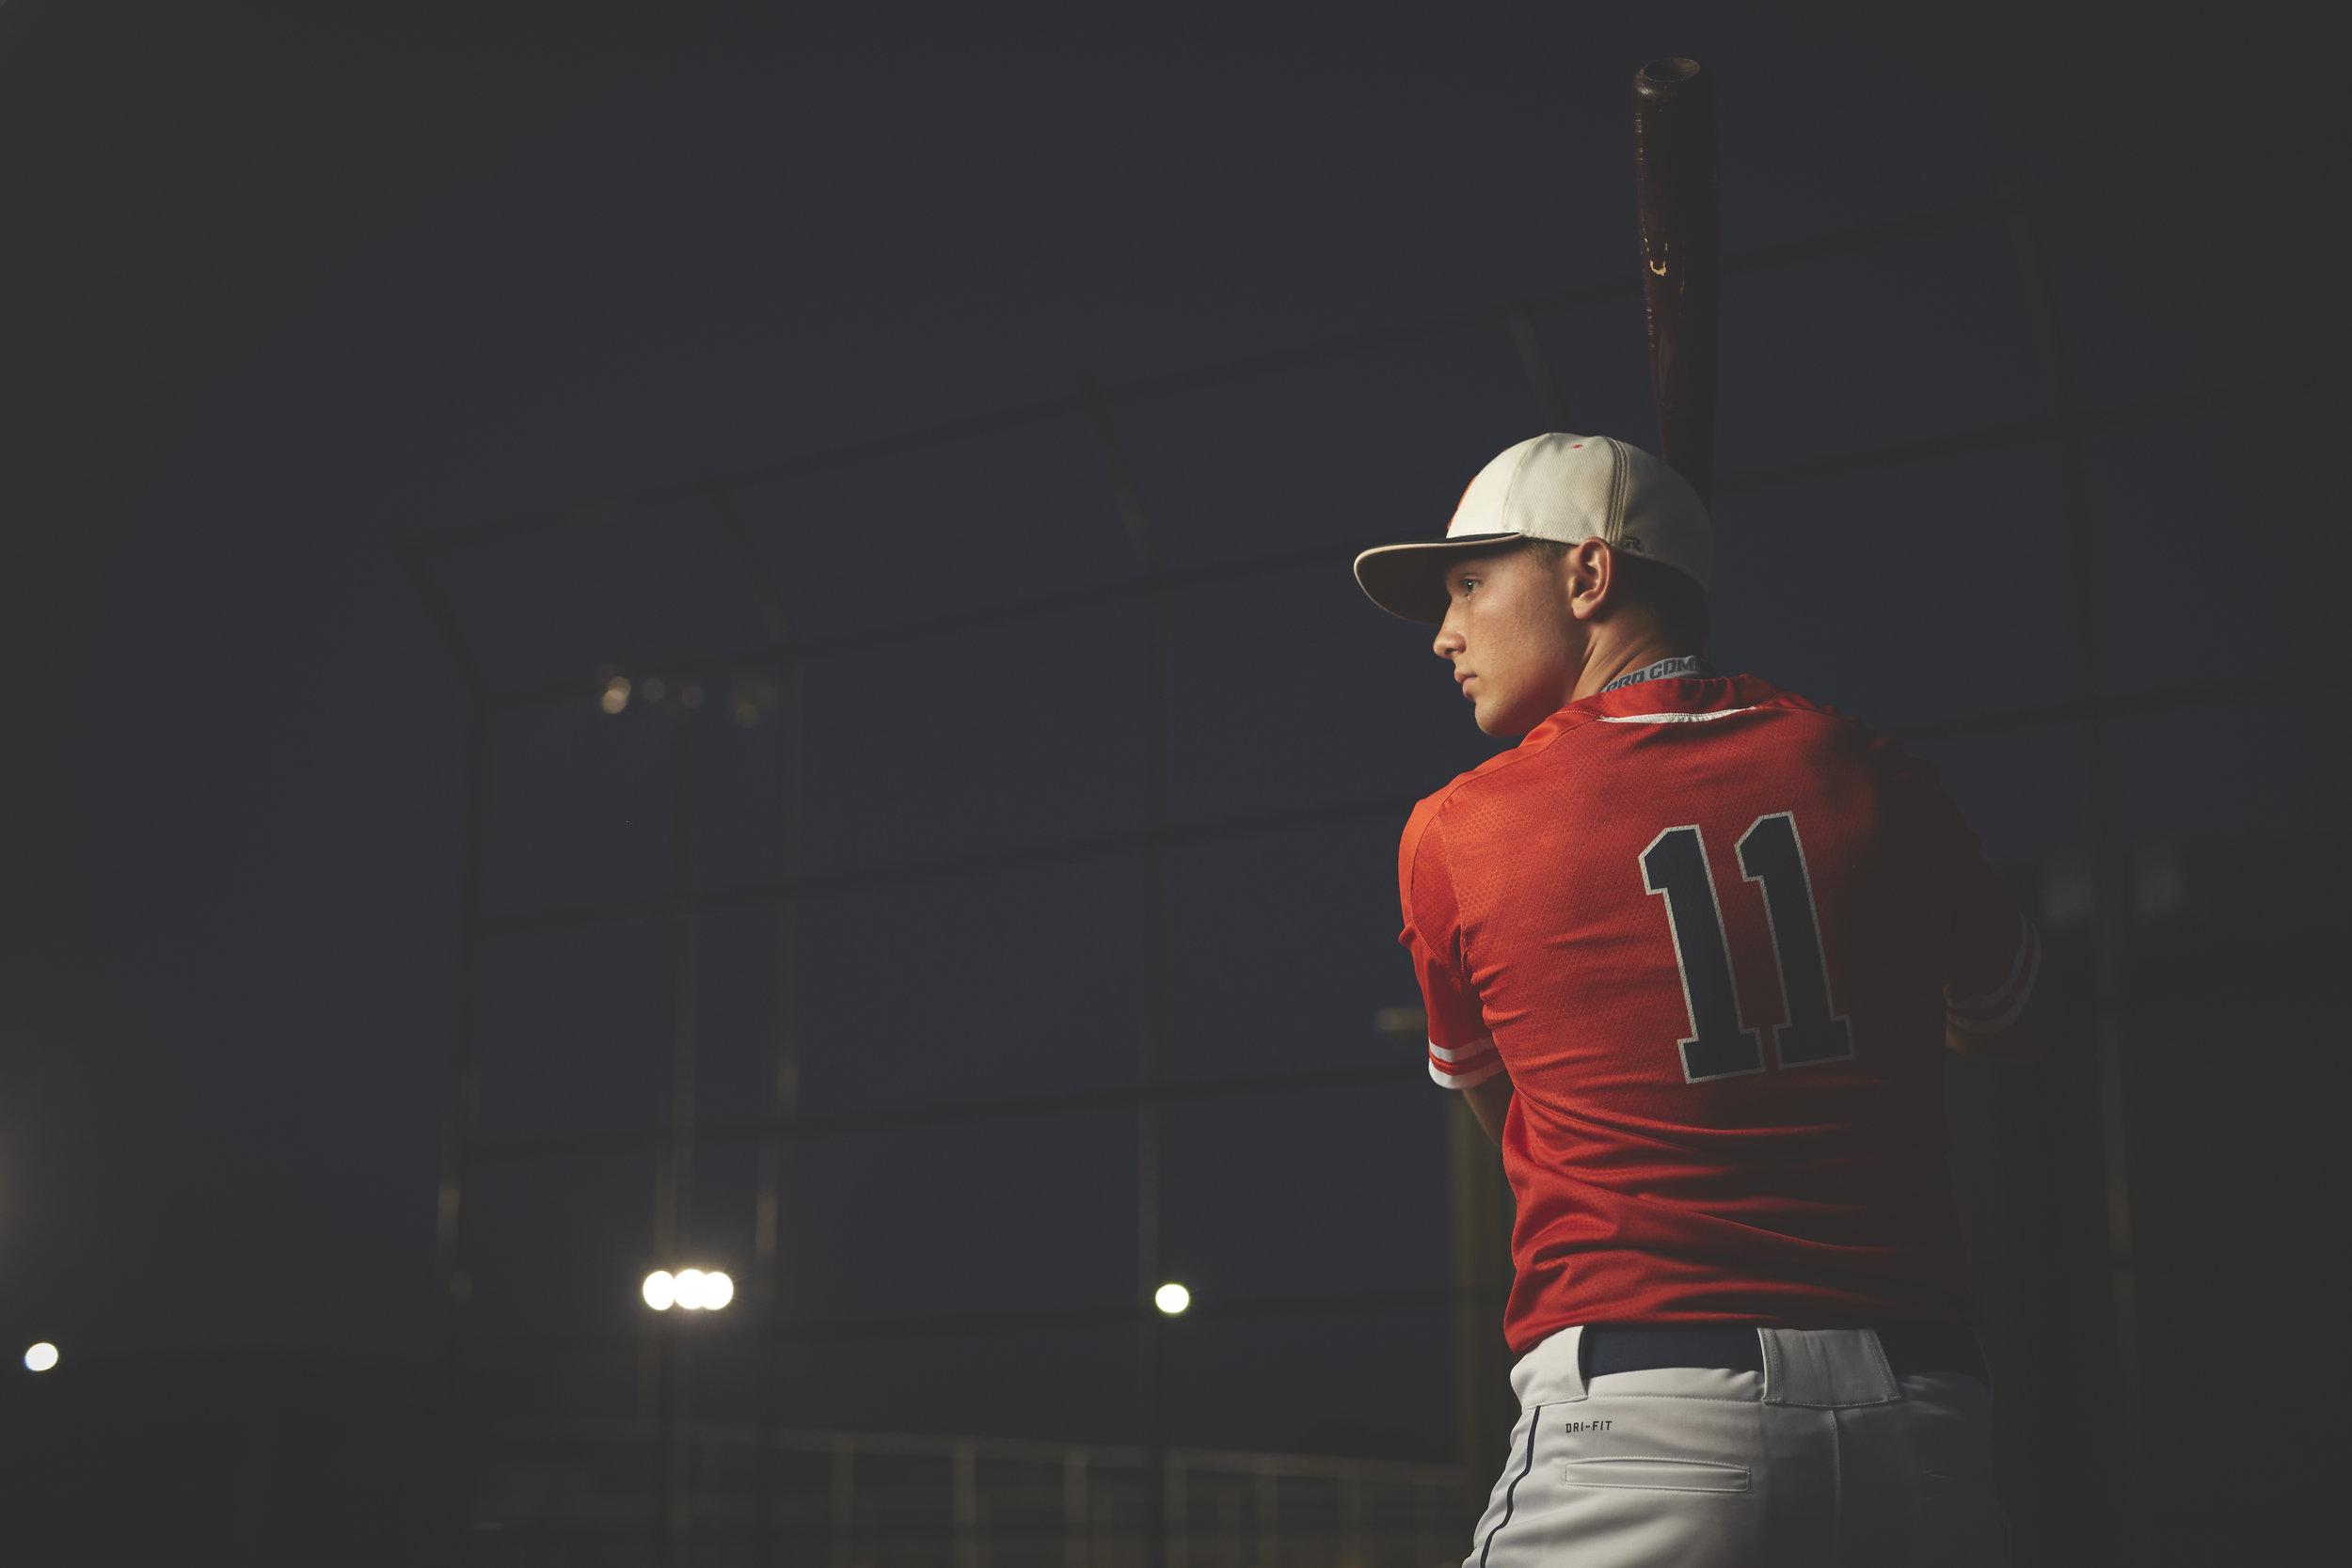 Rochester IL baseball photography